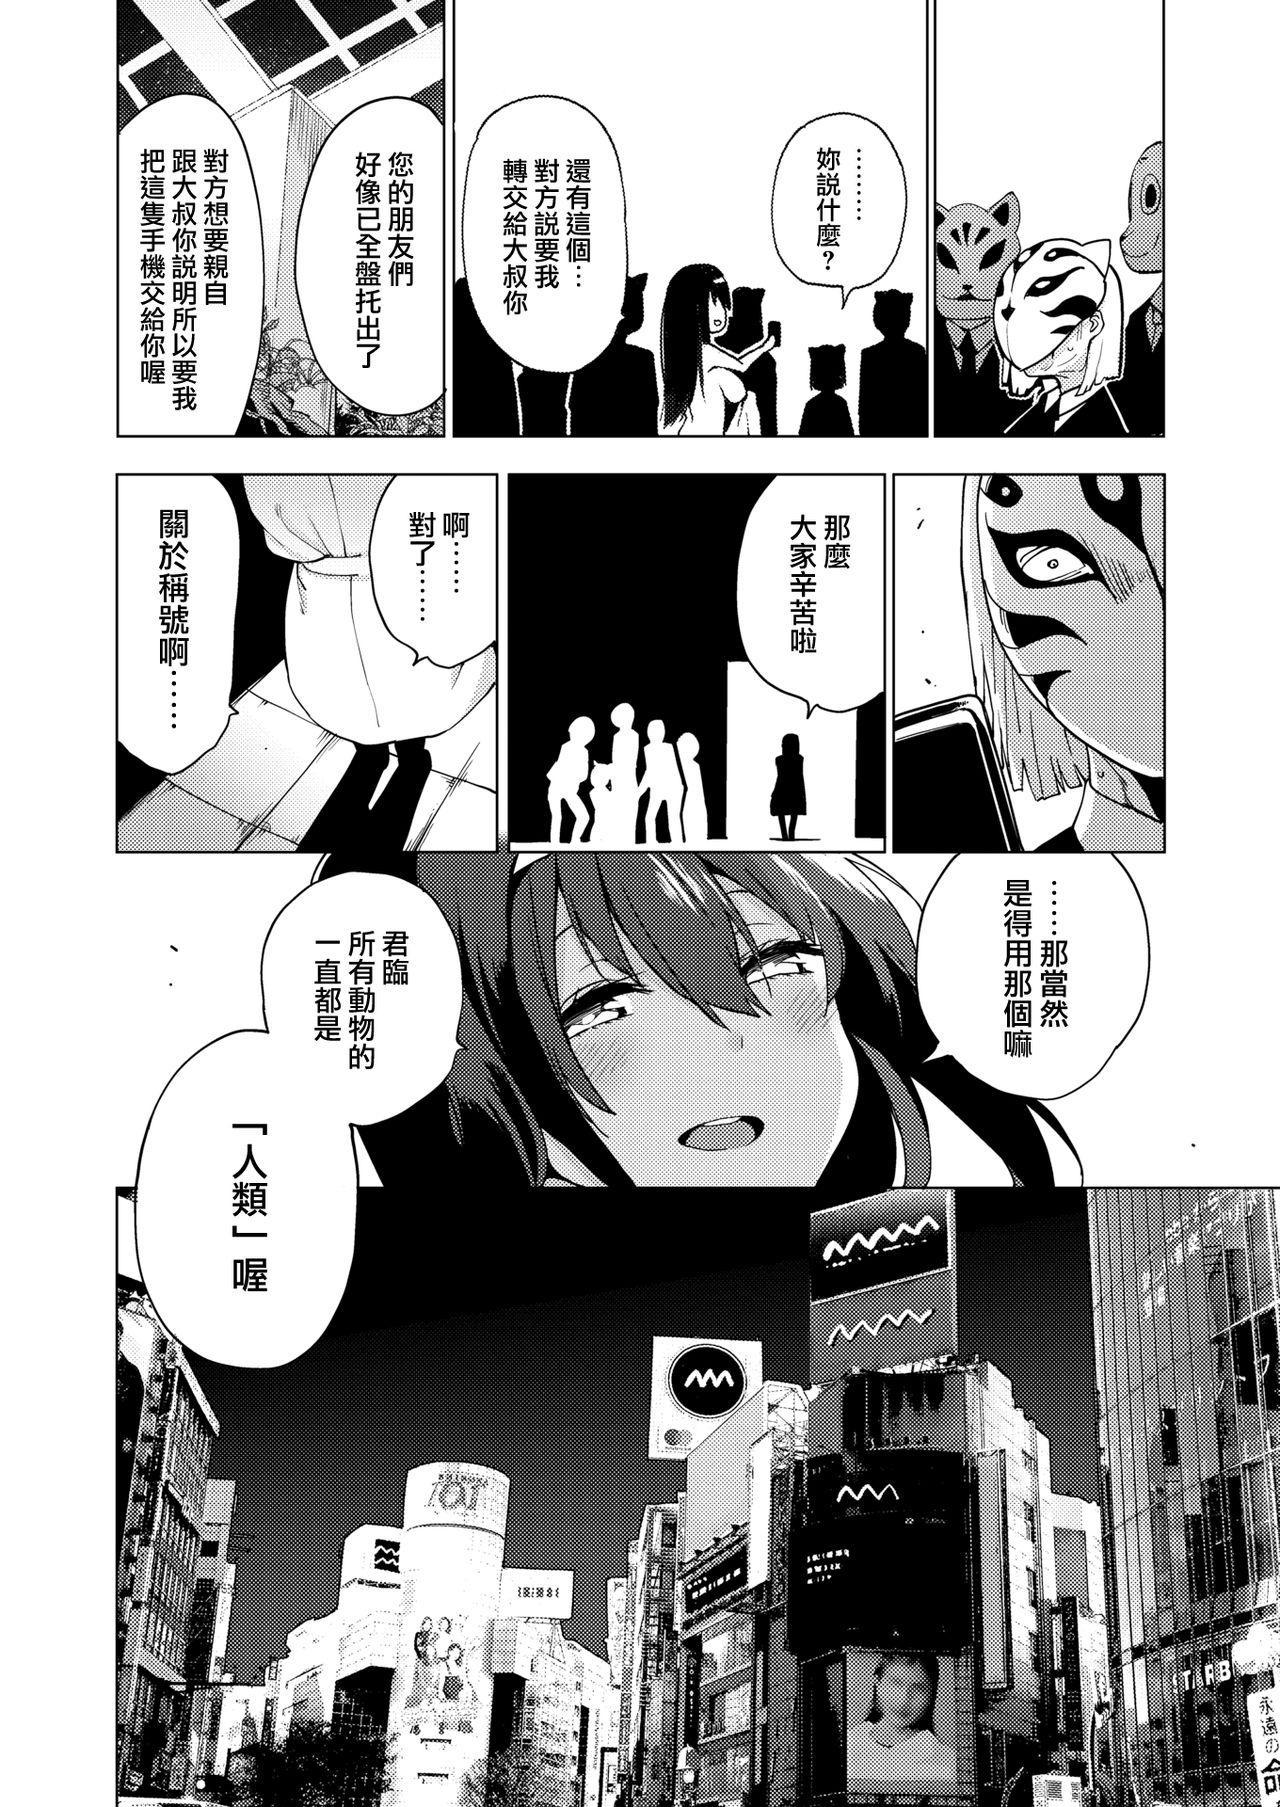 [Kenji] Karigogo ~Nikuyoku Shoujo~ #4 (COMIC X-EROS #76) [Chinese] [就變態翻譯組一人樣 x 我尻故我在個人漢化#37] [Digital] 25